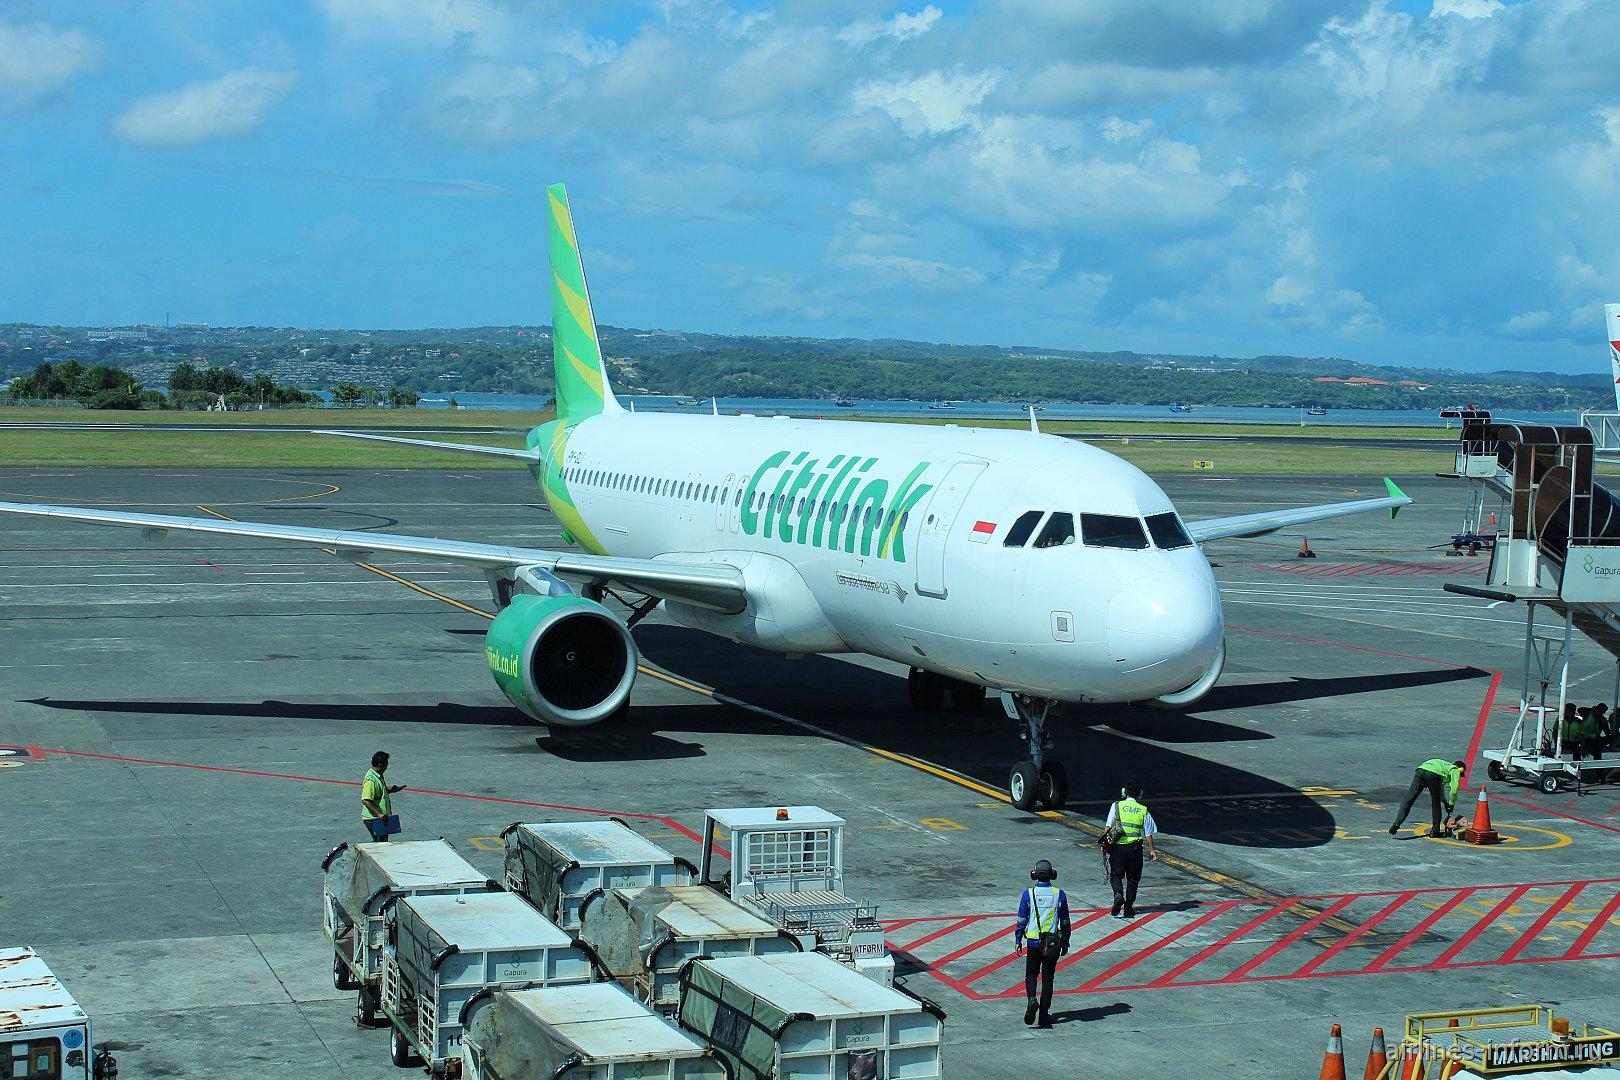 Самолет Airbus A320 авиакомпании Citilink в аэропорту Денпасара